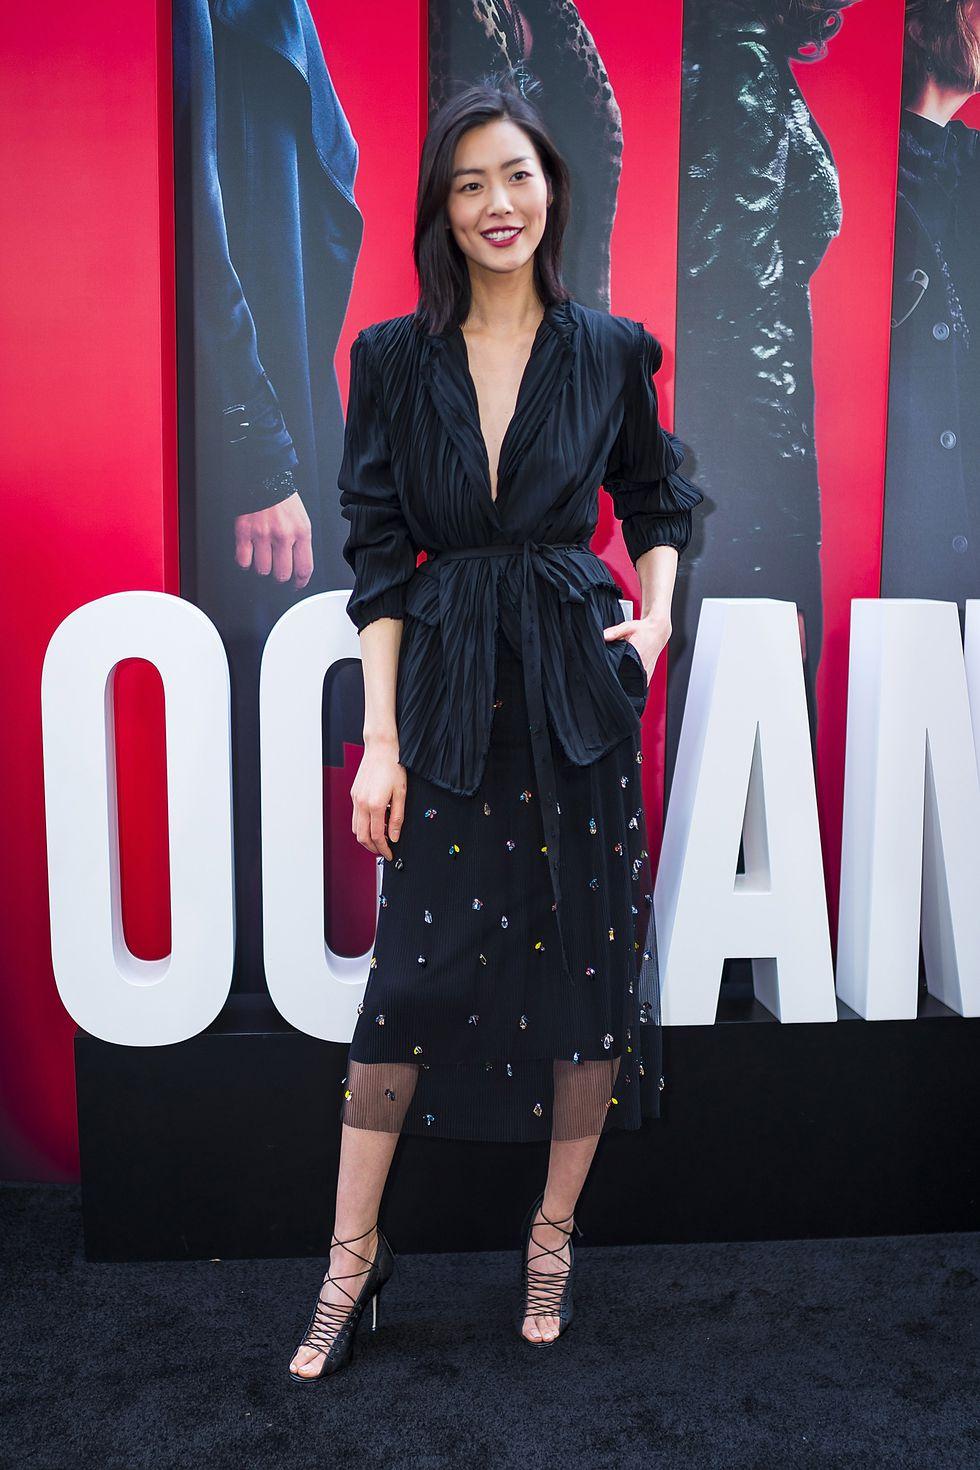 Ocean 8's Red Carpet Premier Was a Fashion Haven